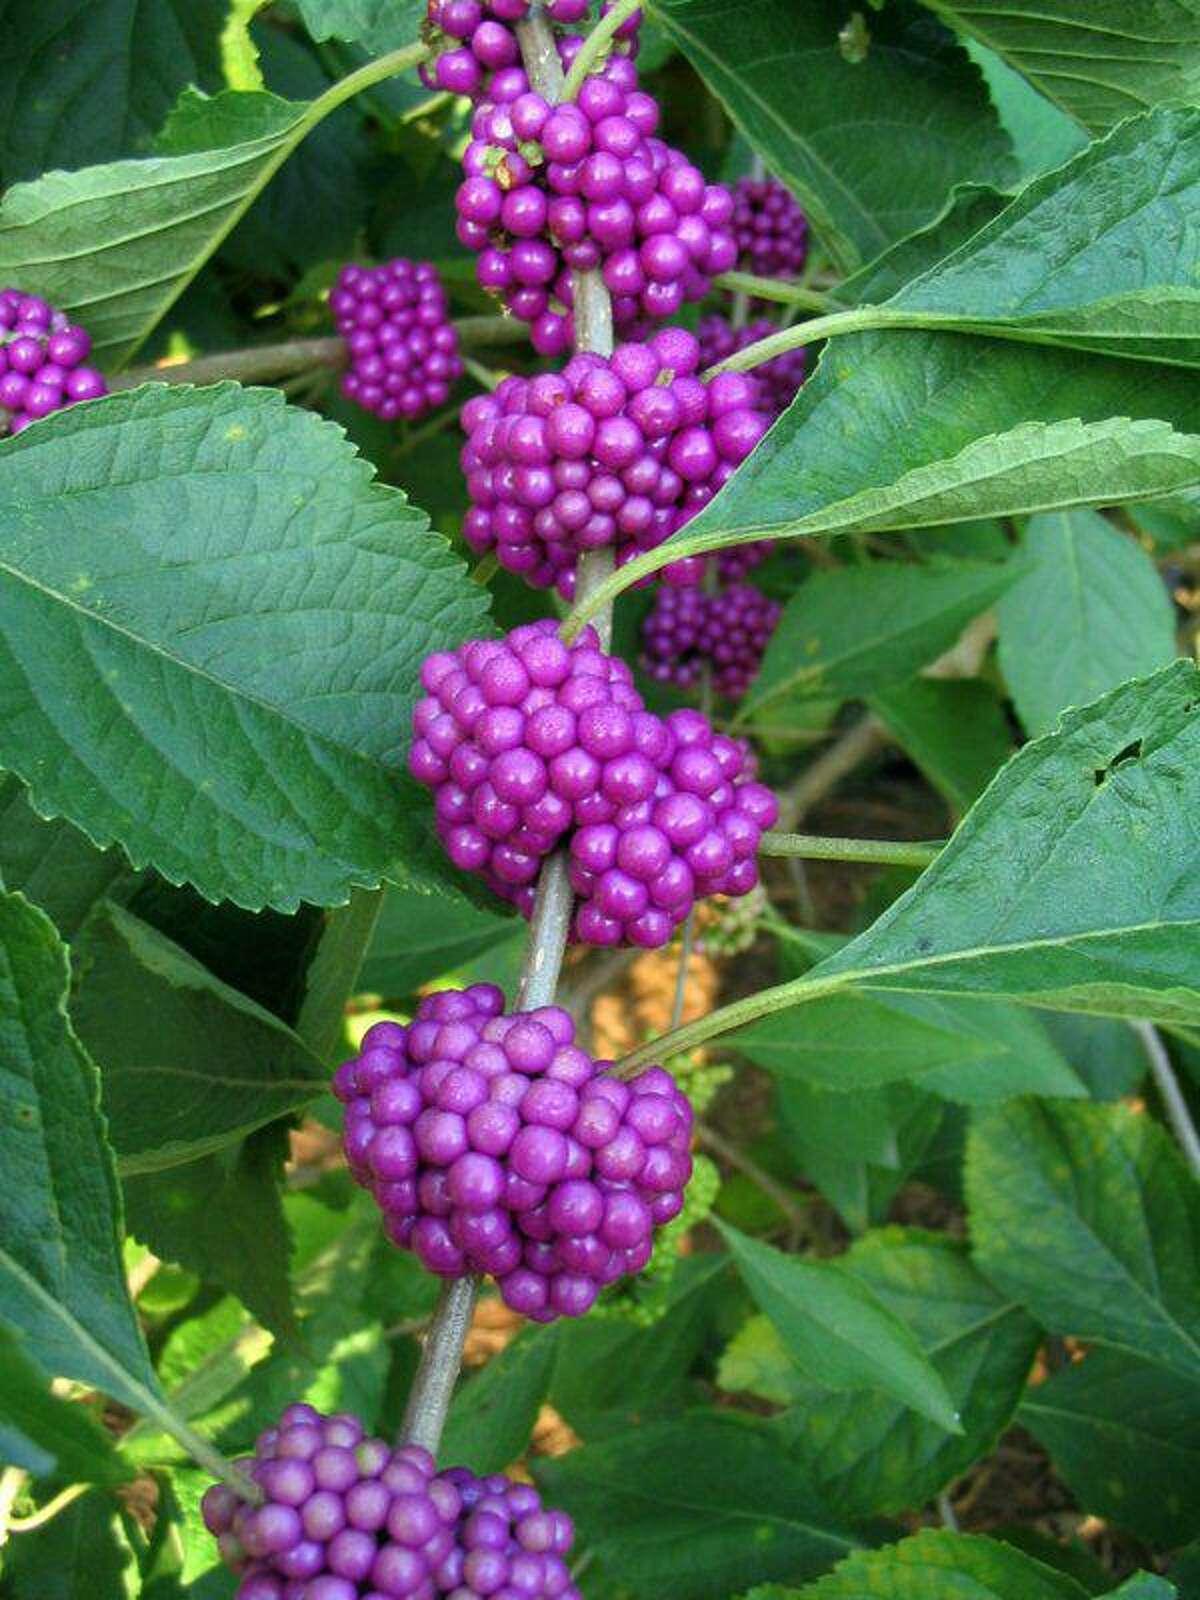 The American beautyberry, Calicarpa americana.